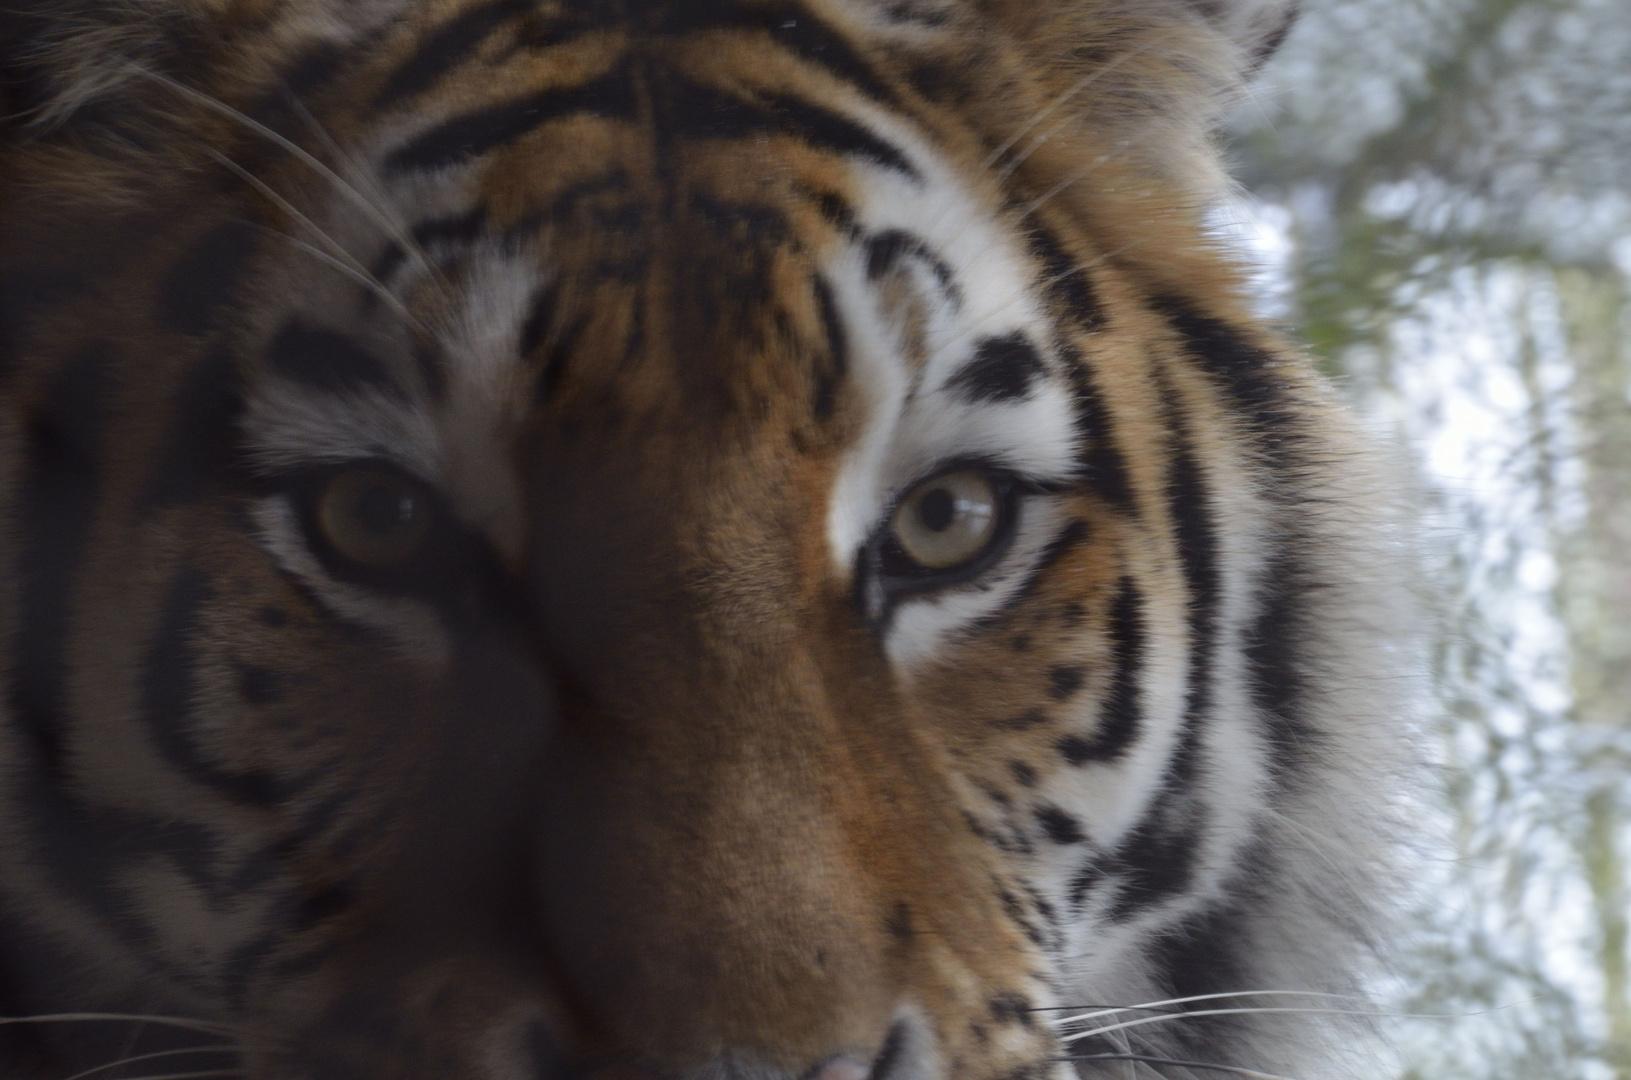 Tiger sehr nah